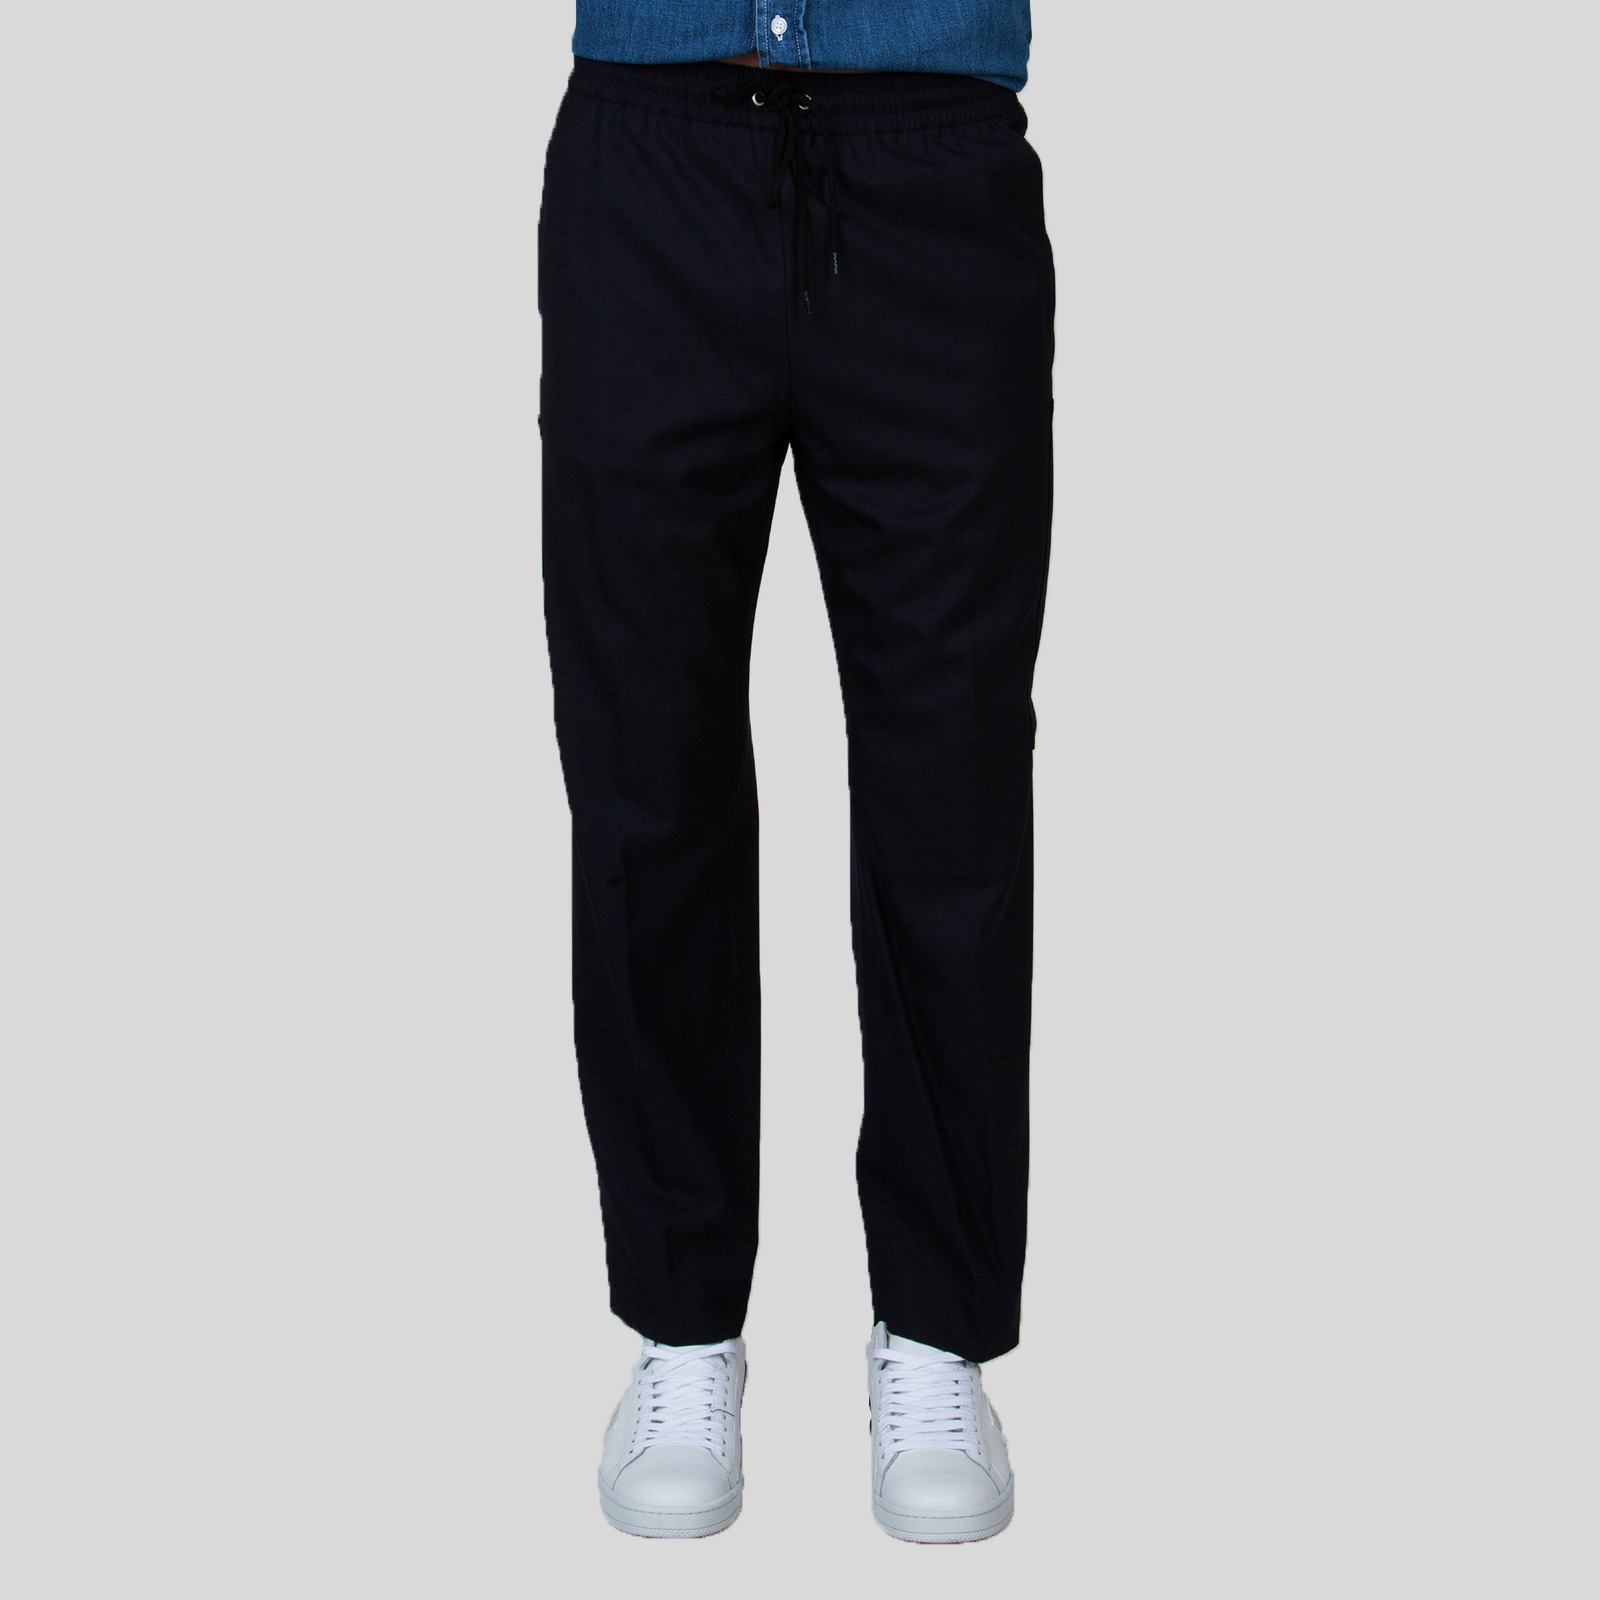 KENZO Μπλε-Μαύρο Παντελόνι Ελαστικη ρυθμιζόμενη μέση με κορδόνια 4 τσέπες 2 αποσπόμενες τσέπες πίσω Μέγεθος δείγματος: 46 Σύνθεση: 100% Μάλλι